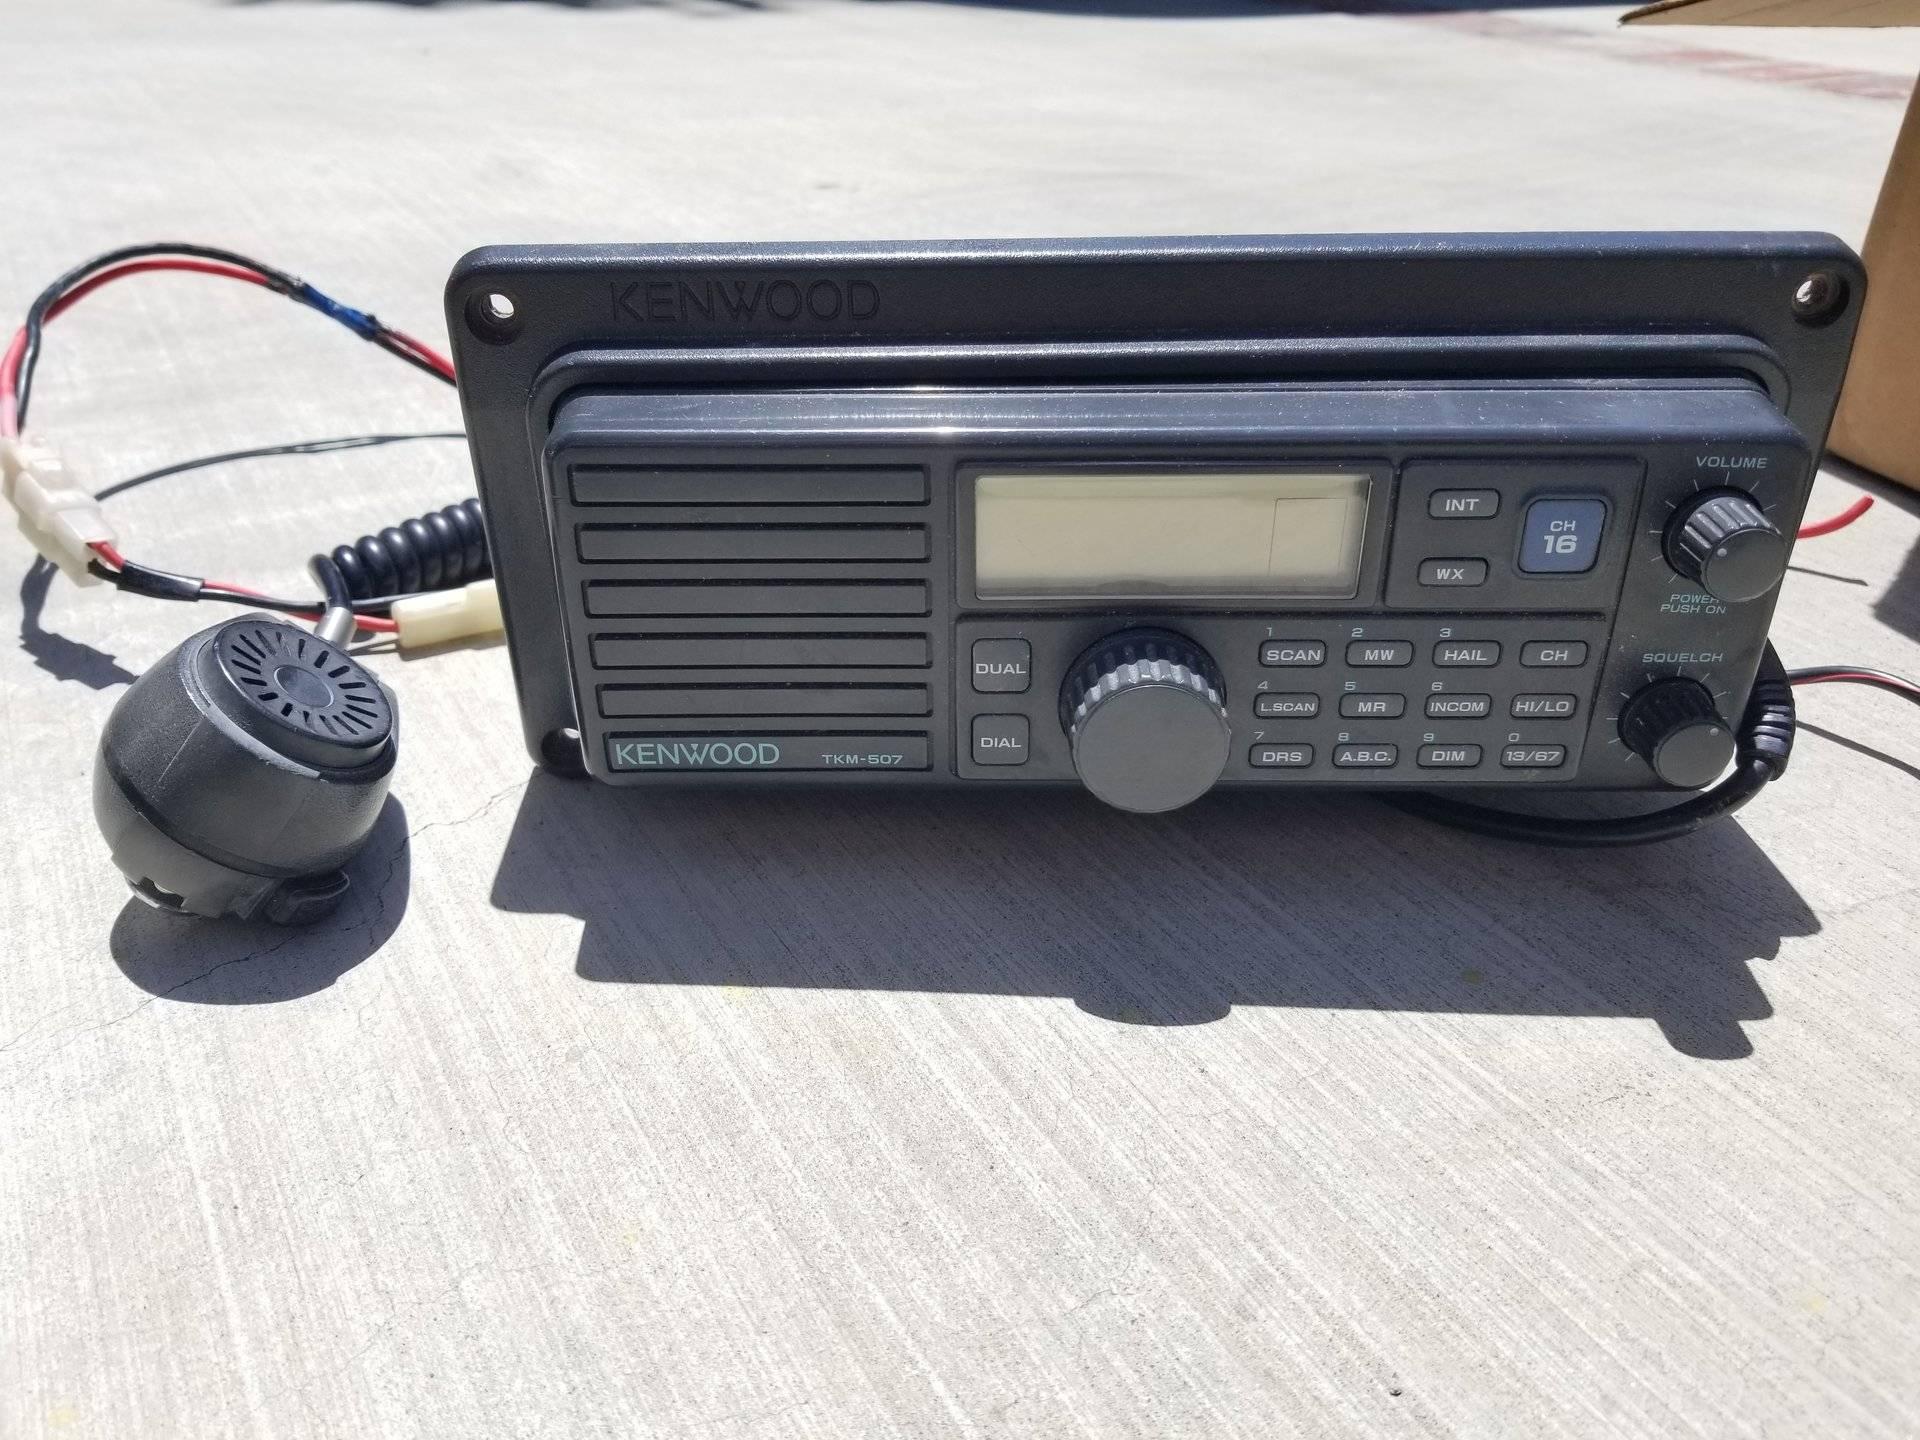 SOLD - Electronics Lot - Simrad NSE 8, 1KW Airmar B260, VHF